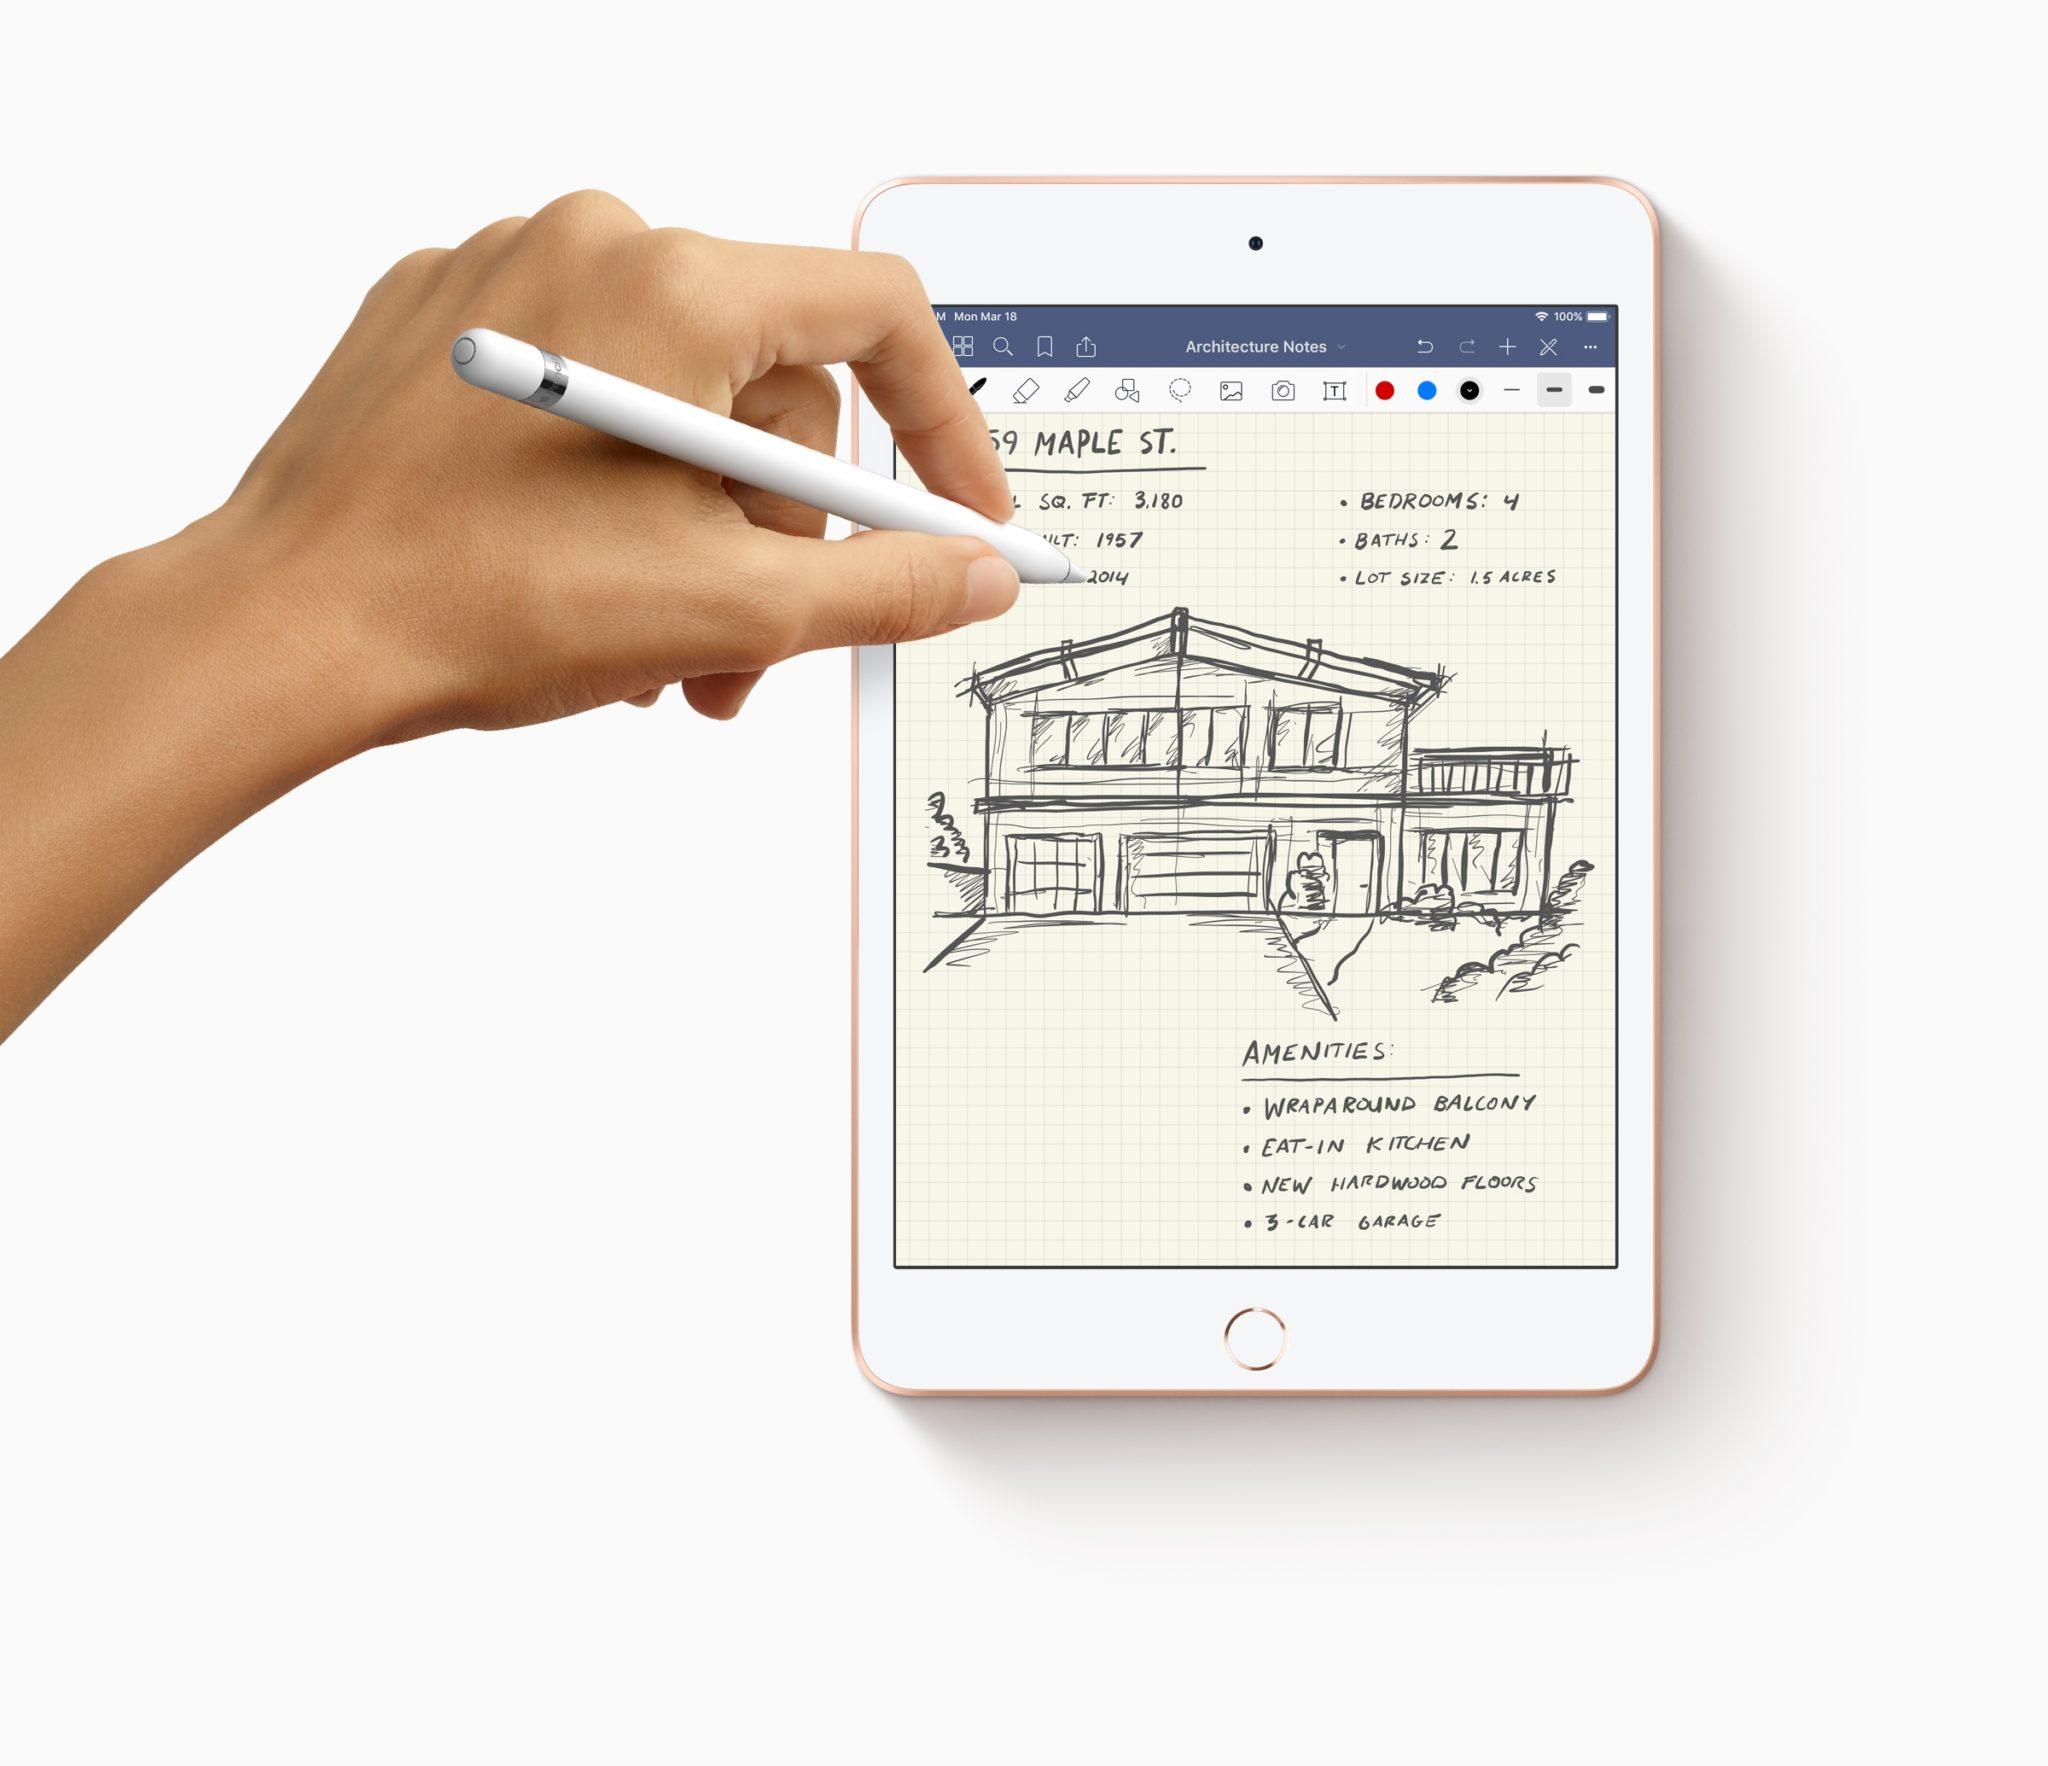 New iPad Mini Apple Pencil with hands drawing 03162019 - iPad mini ožíva, aj s podporou pre Apple Pencil a rýchlym A12 čipom